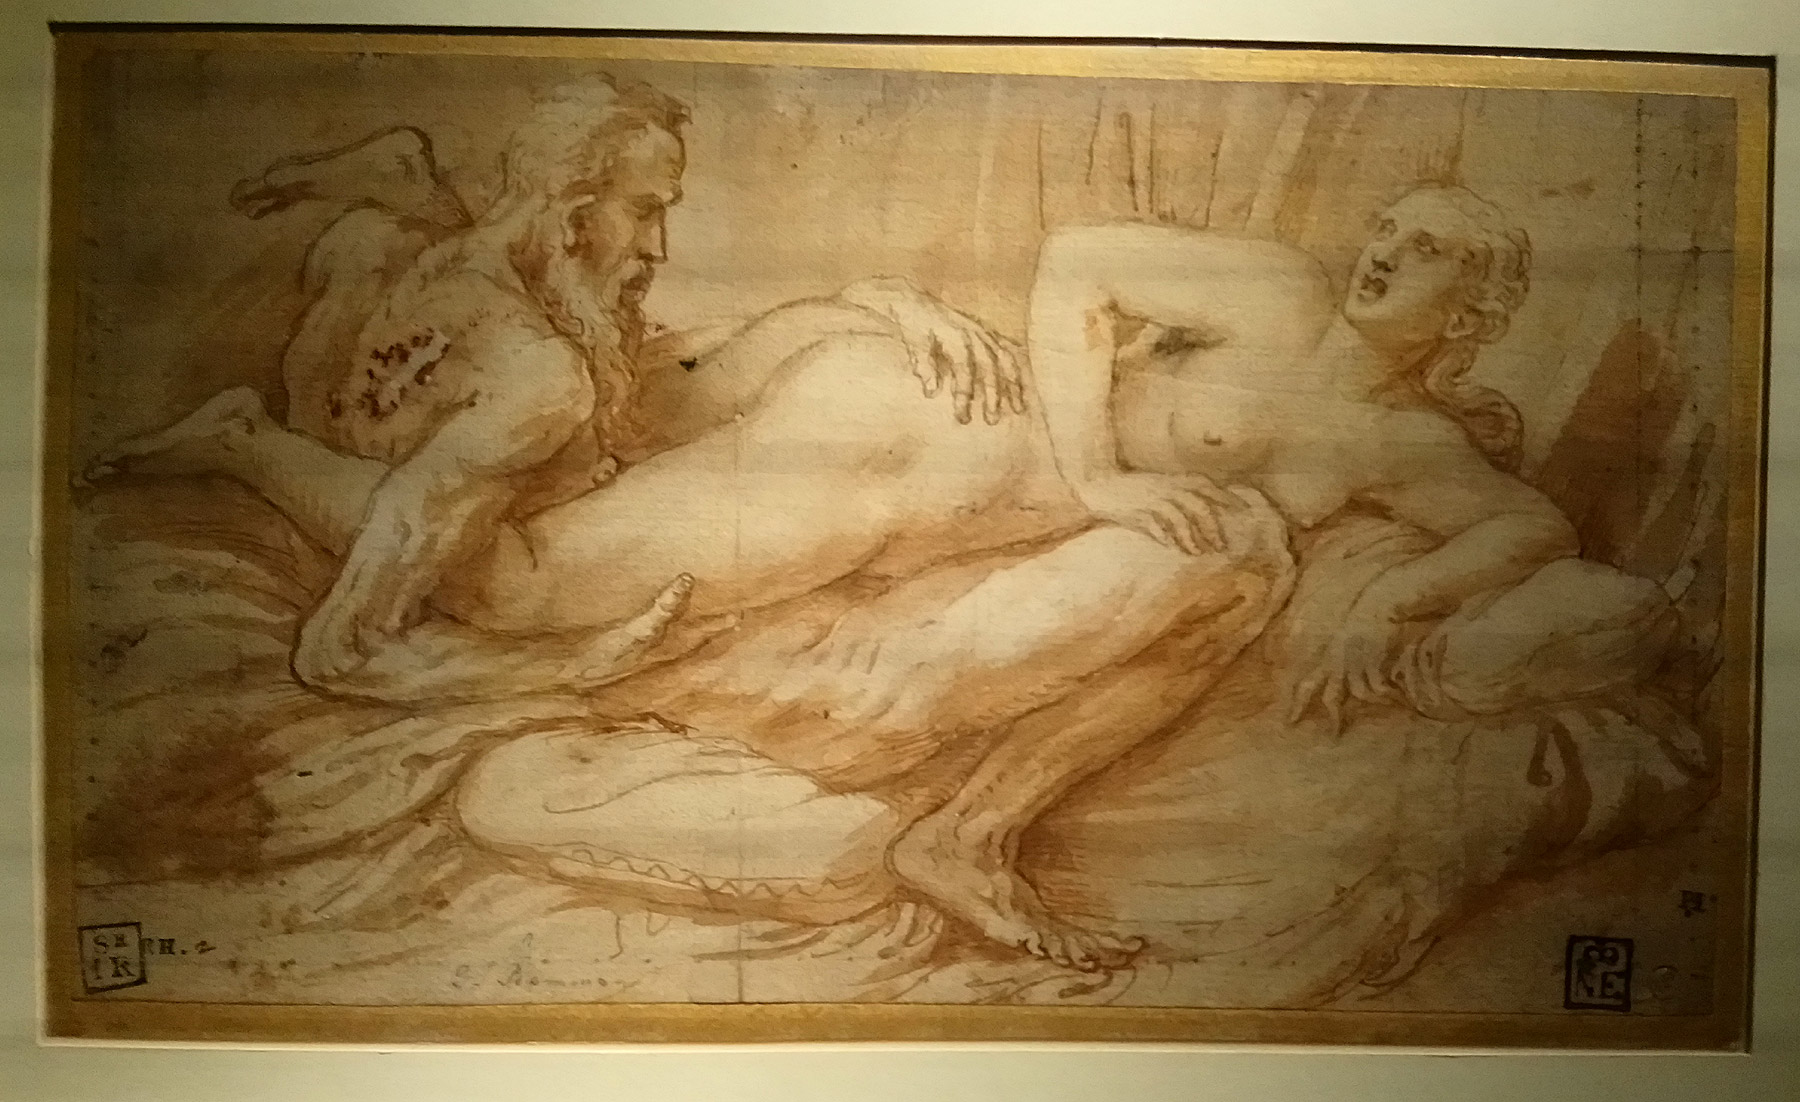 Giulio Romano, Due amanti (1525-1528 circa; penna, inchiostro, carboncino su carta, 130 x 226 mm; Budapest, Szépmúveszéti Múzeum)